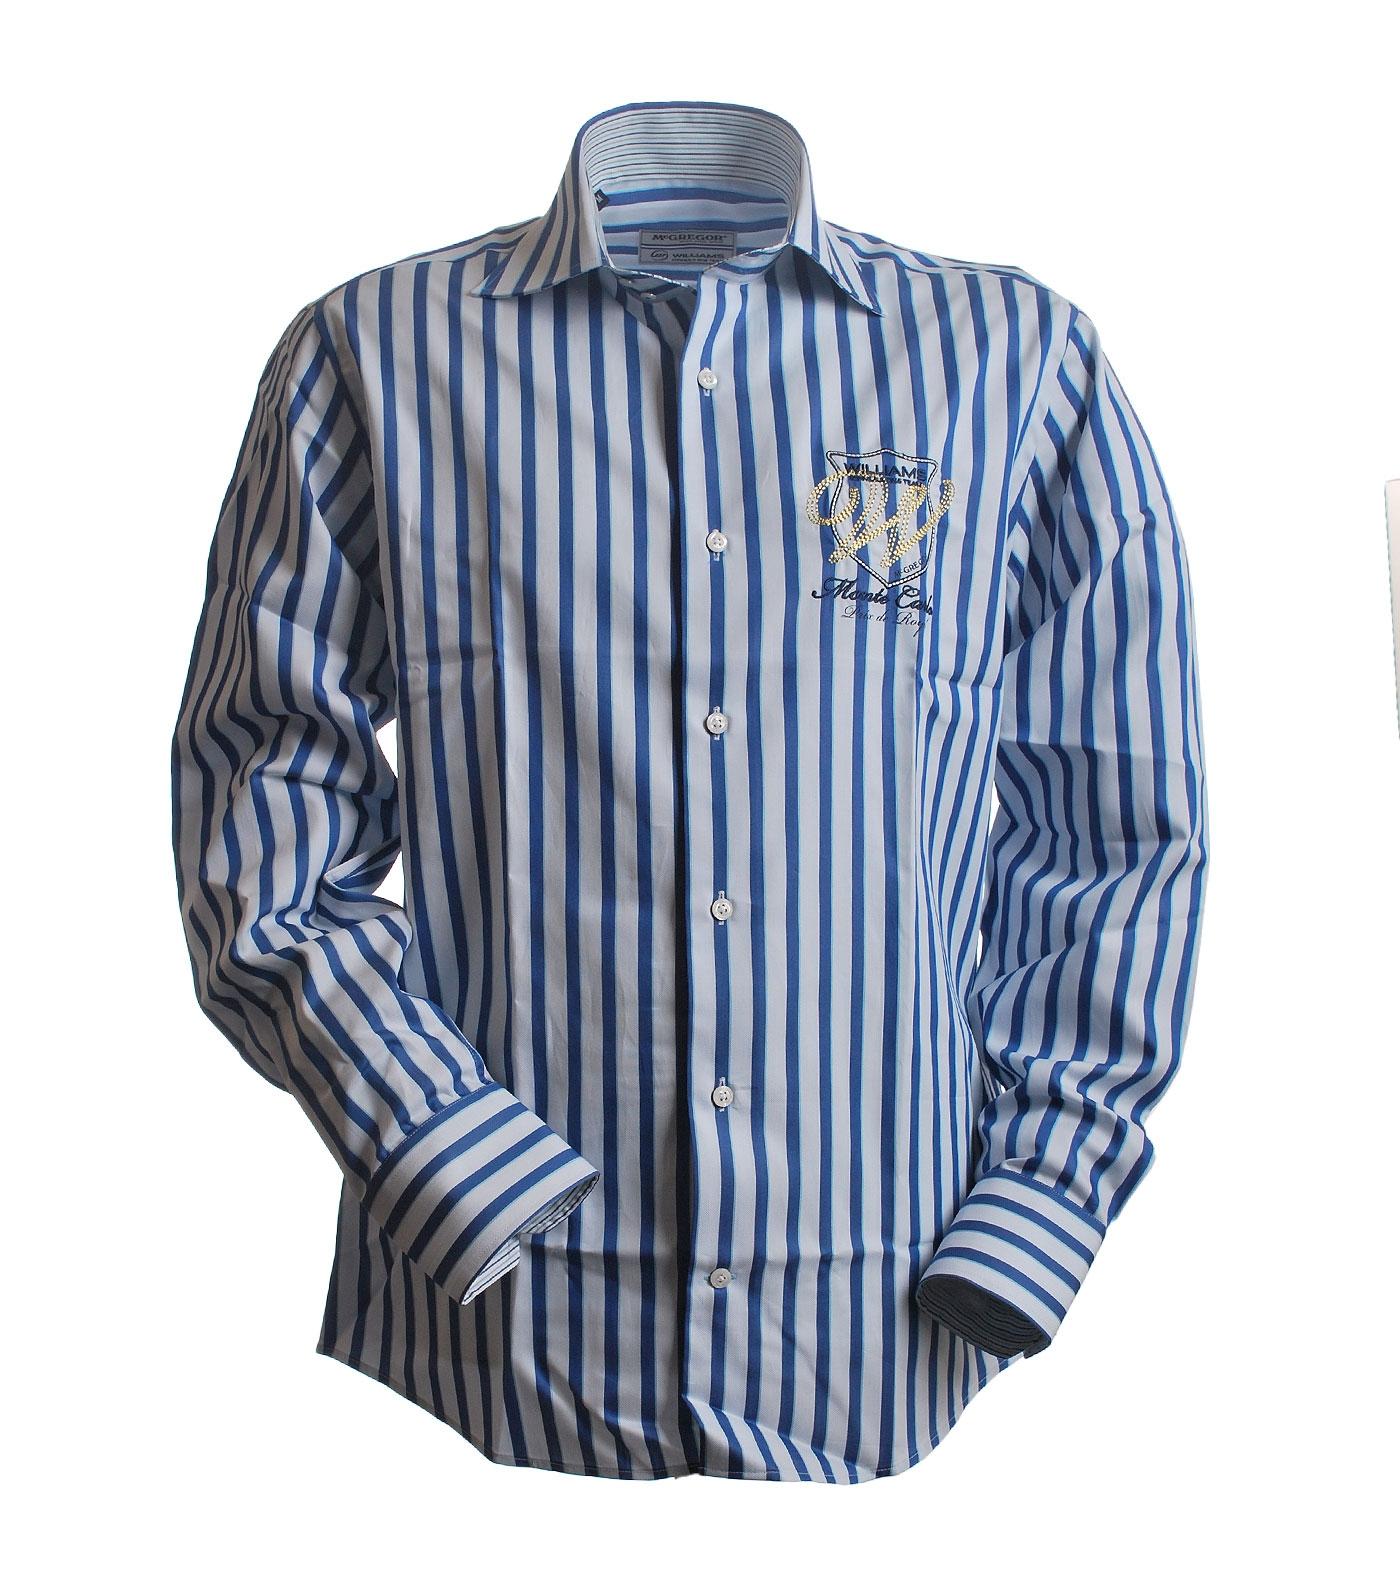 mcgregor williams shirt mirabeau haute online bestellen. Black Bedroom Furniture Sets. Home Design Ideas